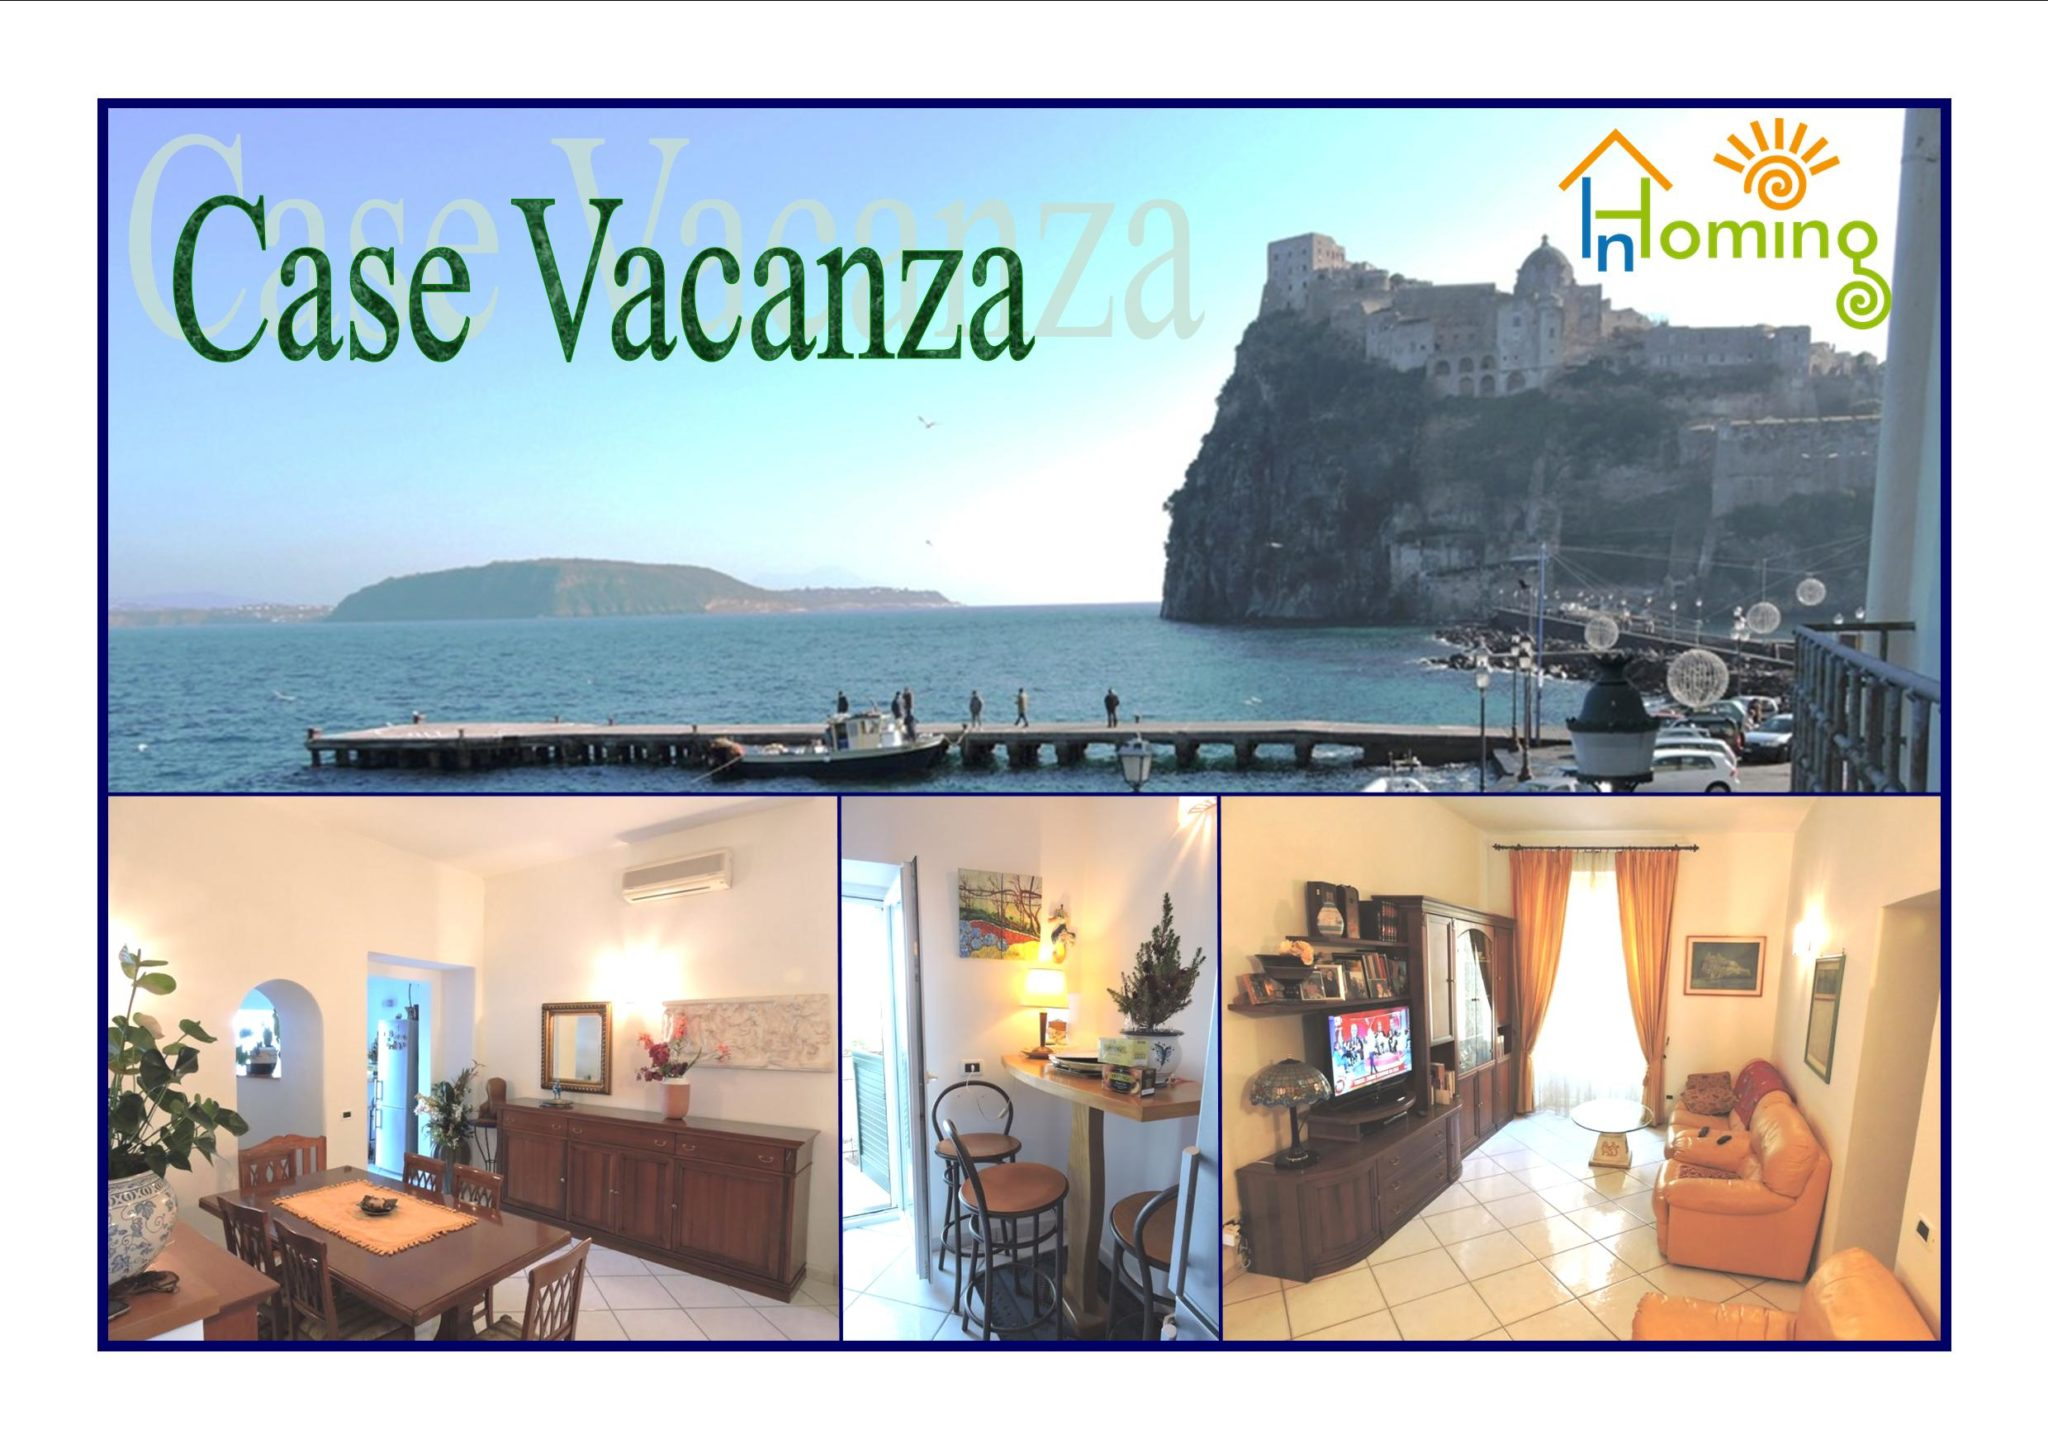 Inhoming Case Vacanza